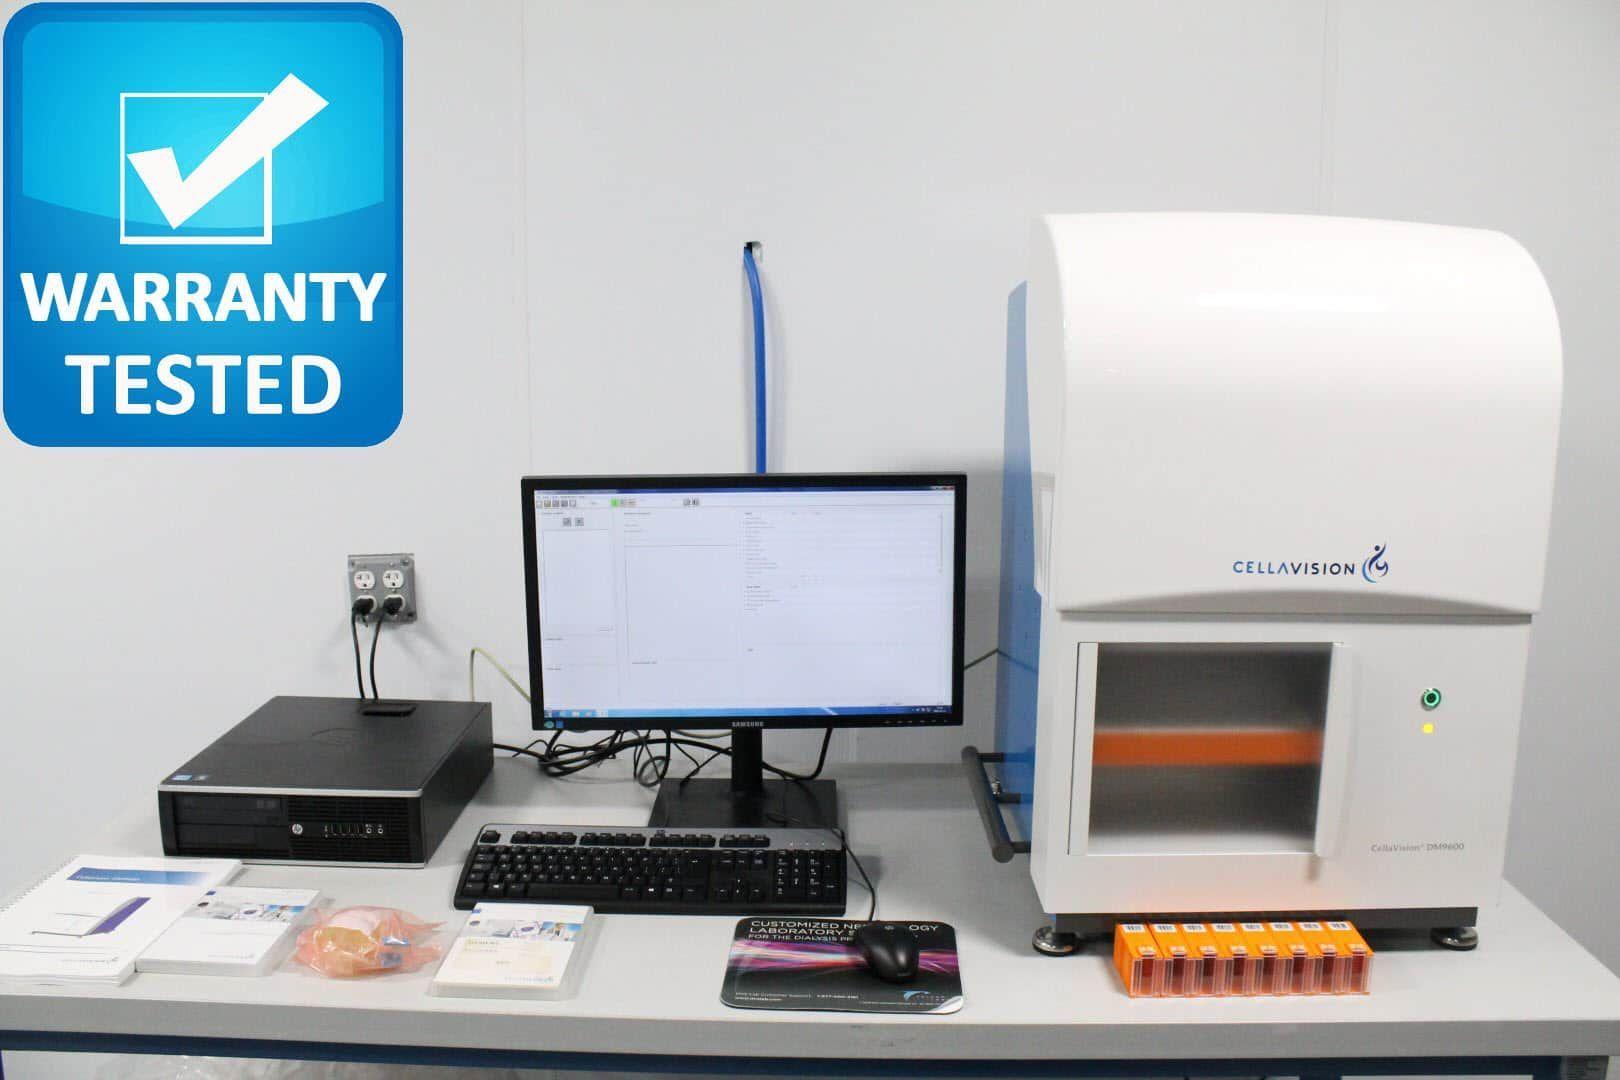 CellaVision DM9600 Digital Cell Morphology Analyzer Unit2